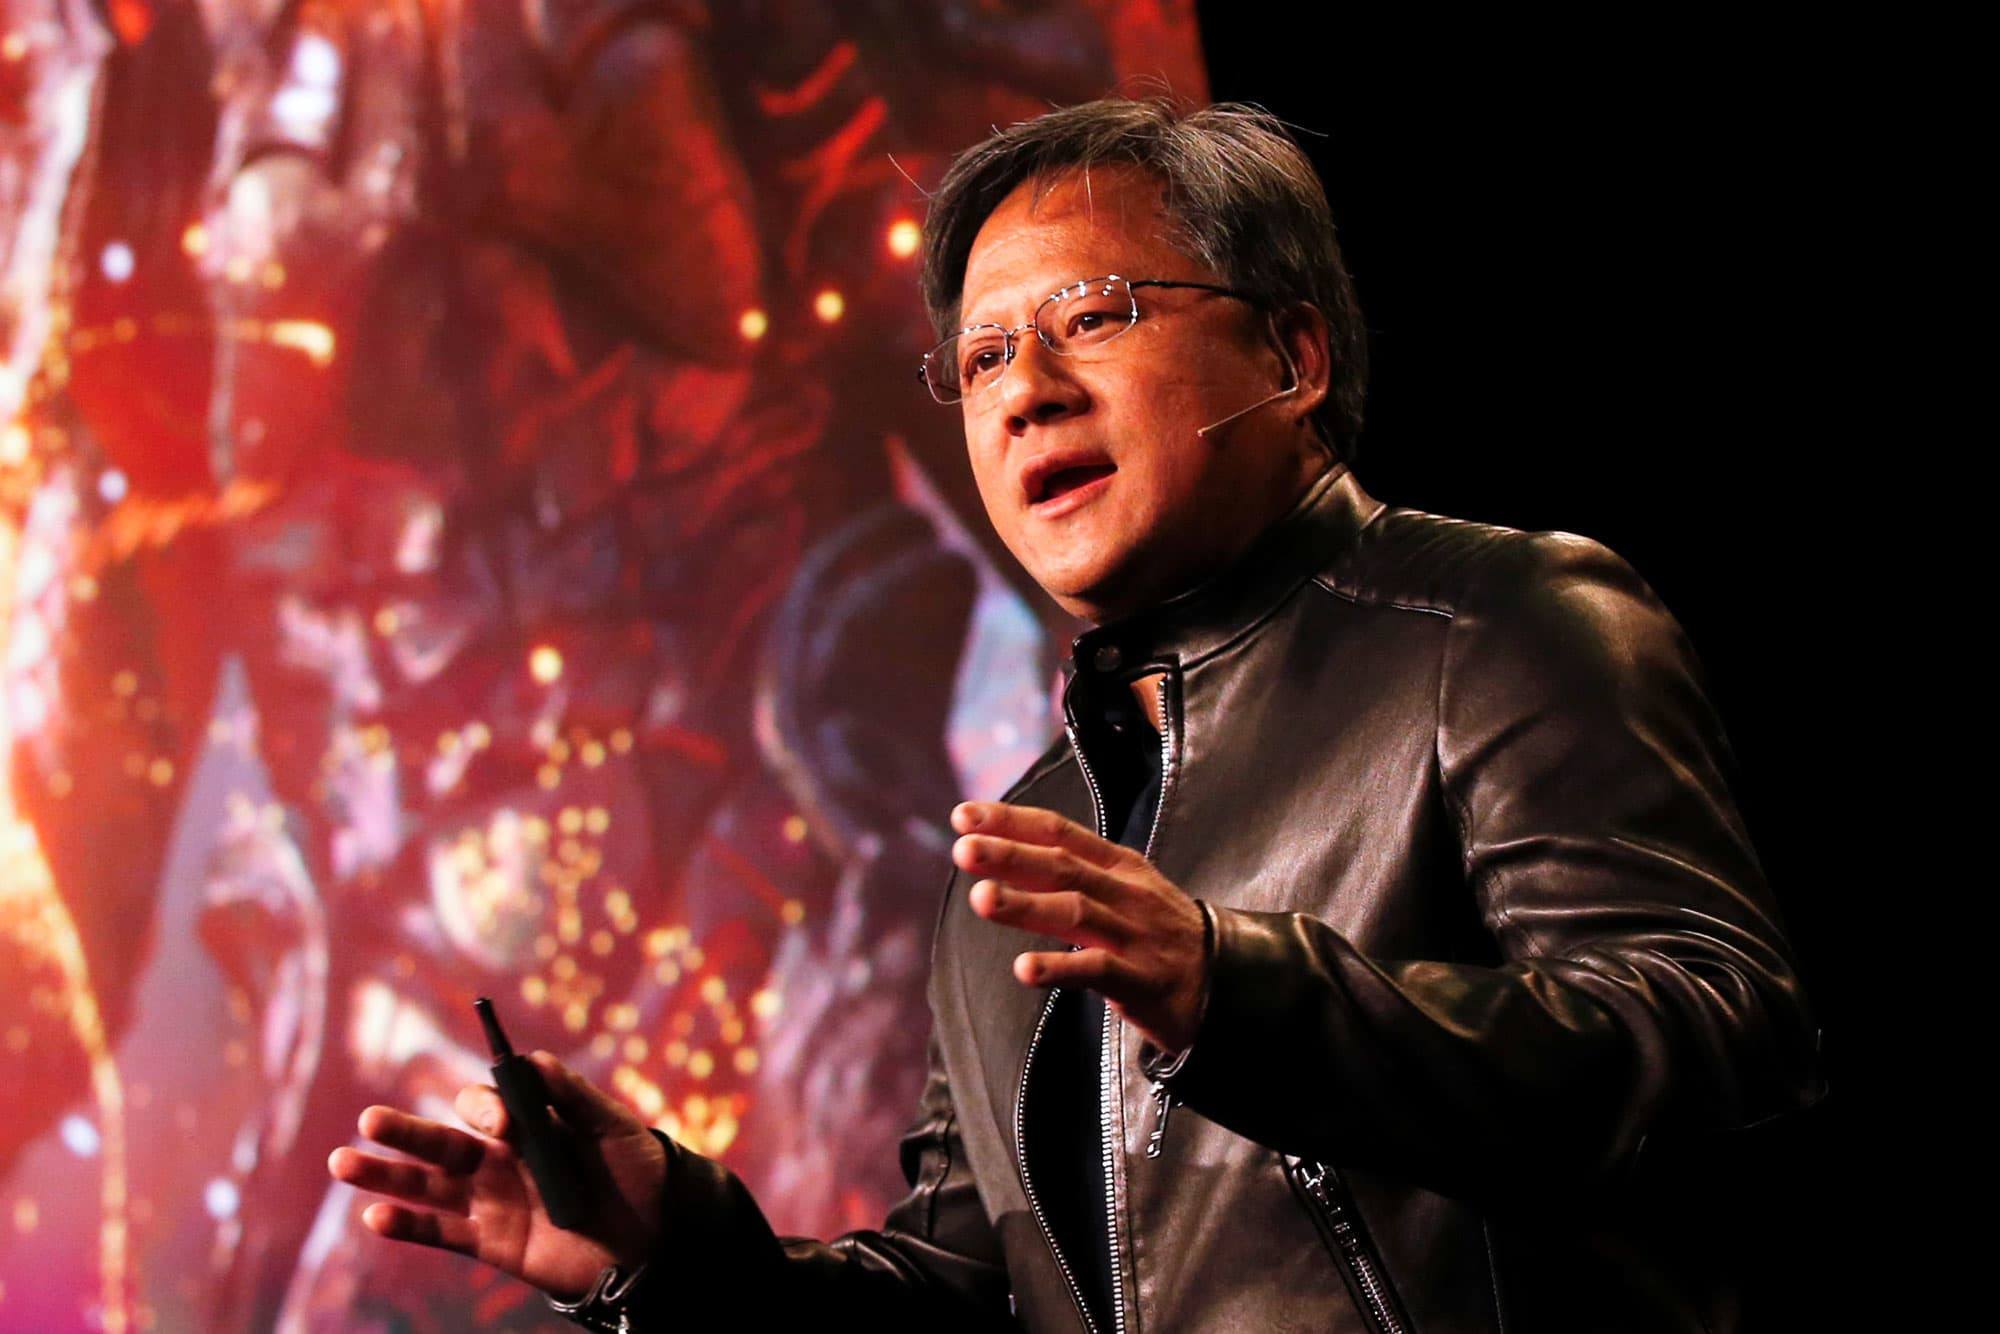 Nvidia revenue guidance misses expectations